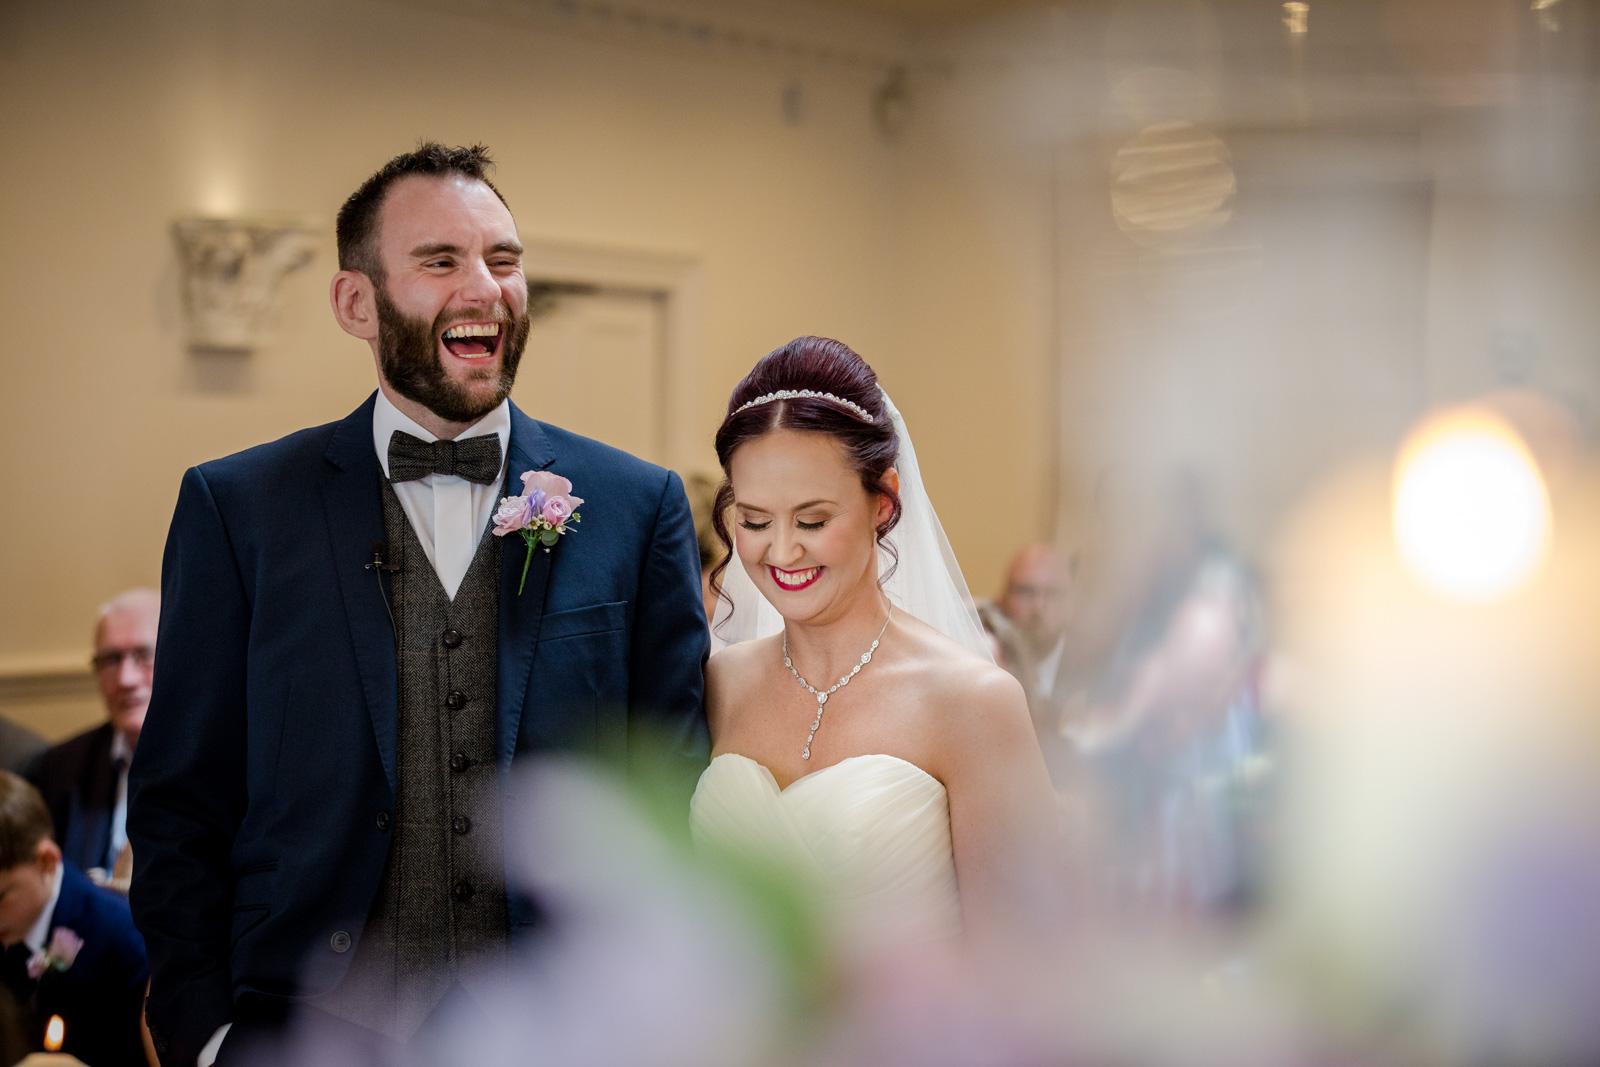 Ashfield House Wedding in Wigan